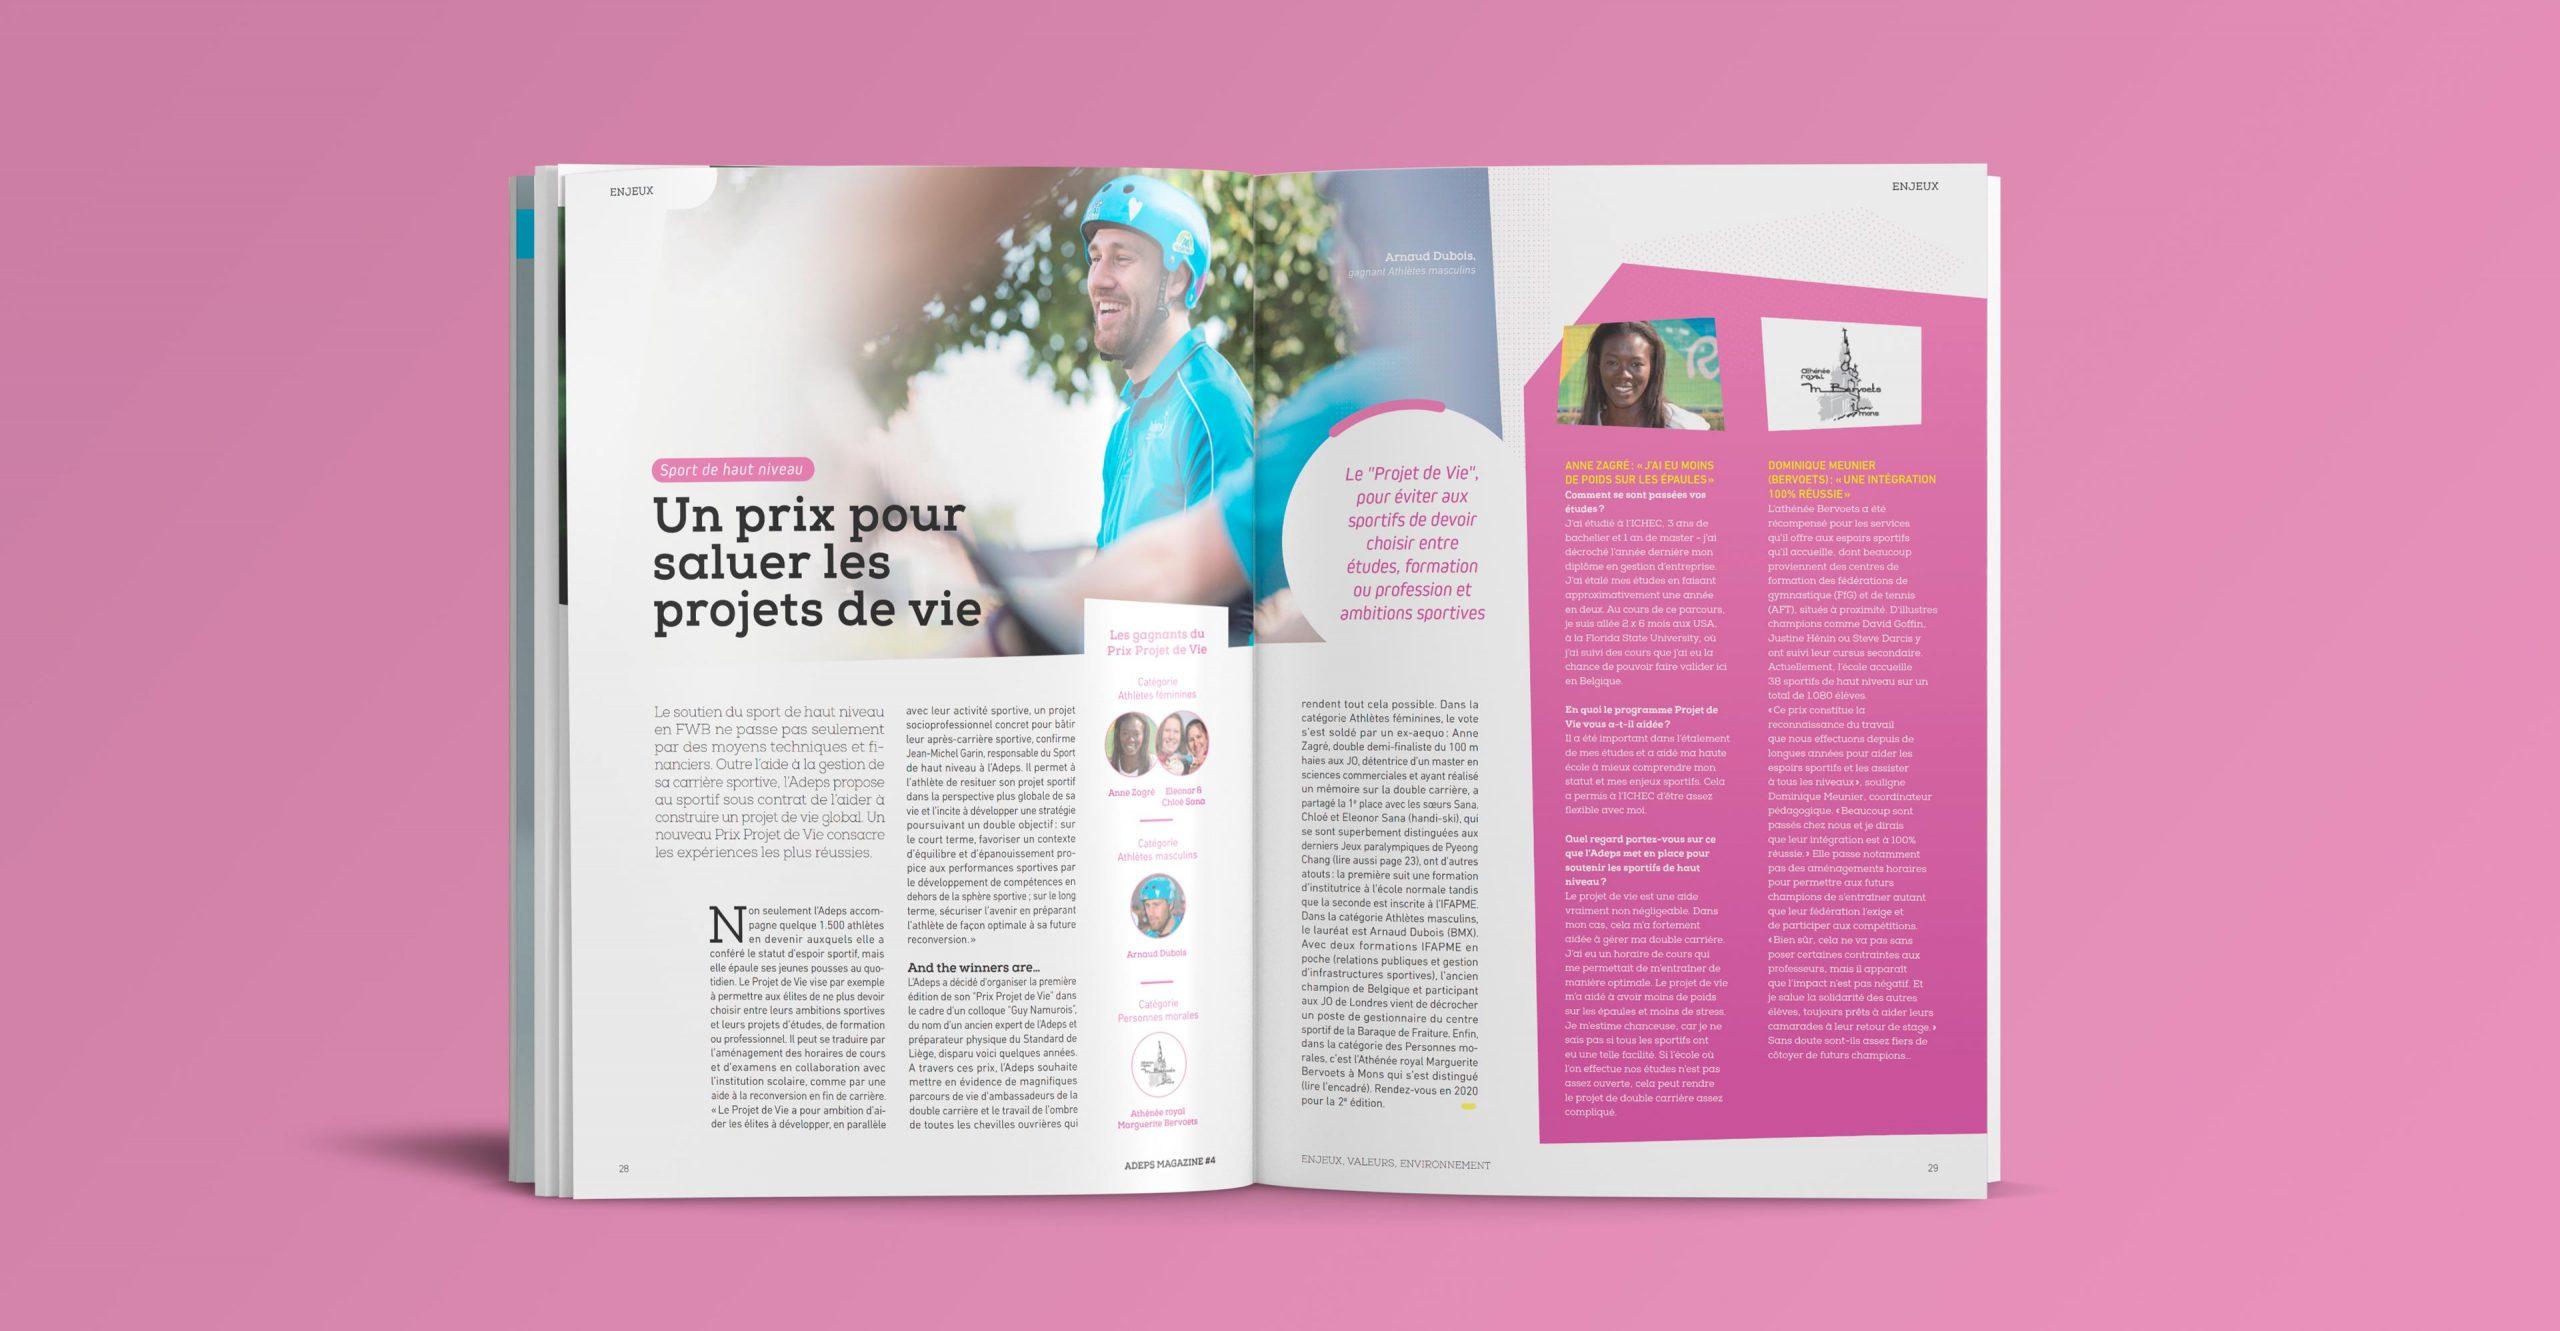 Layout of the magazine